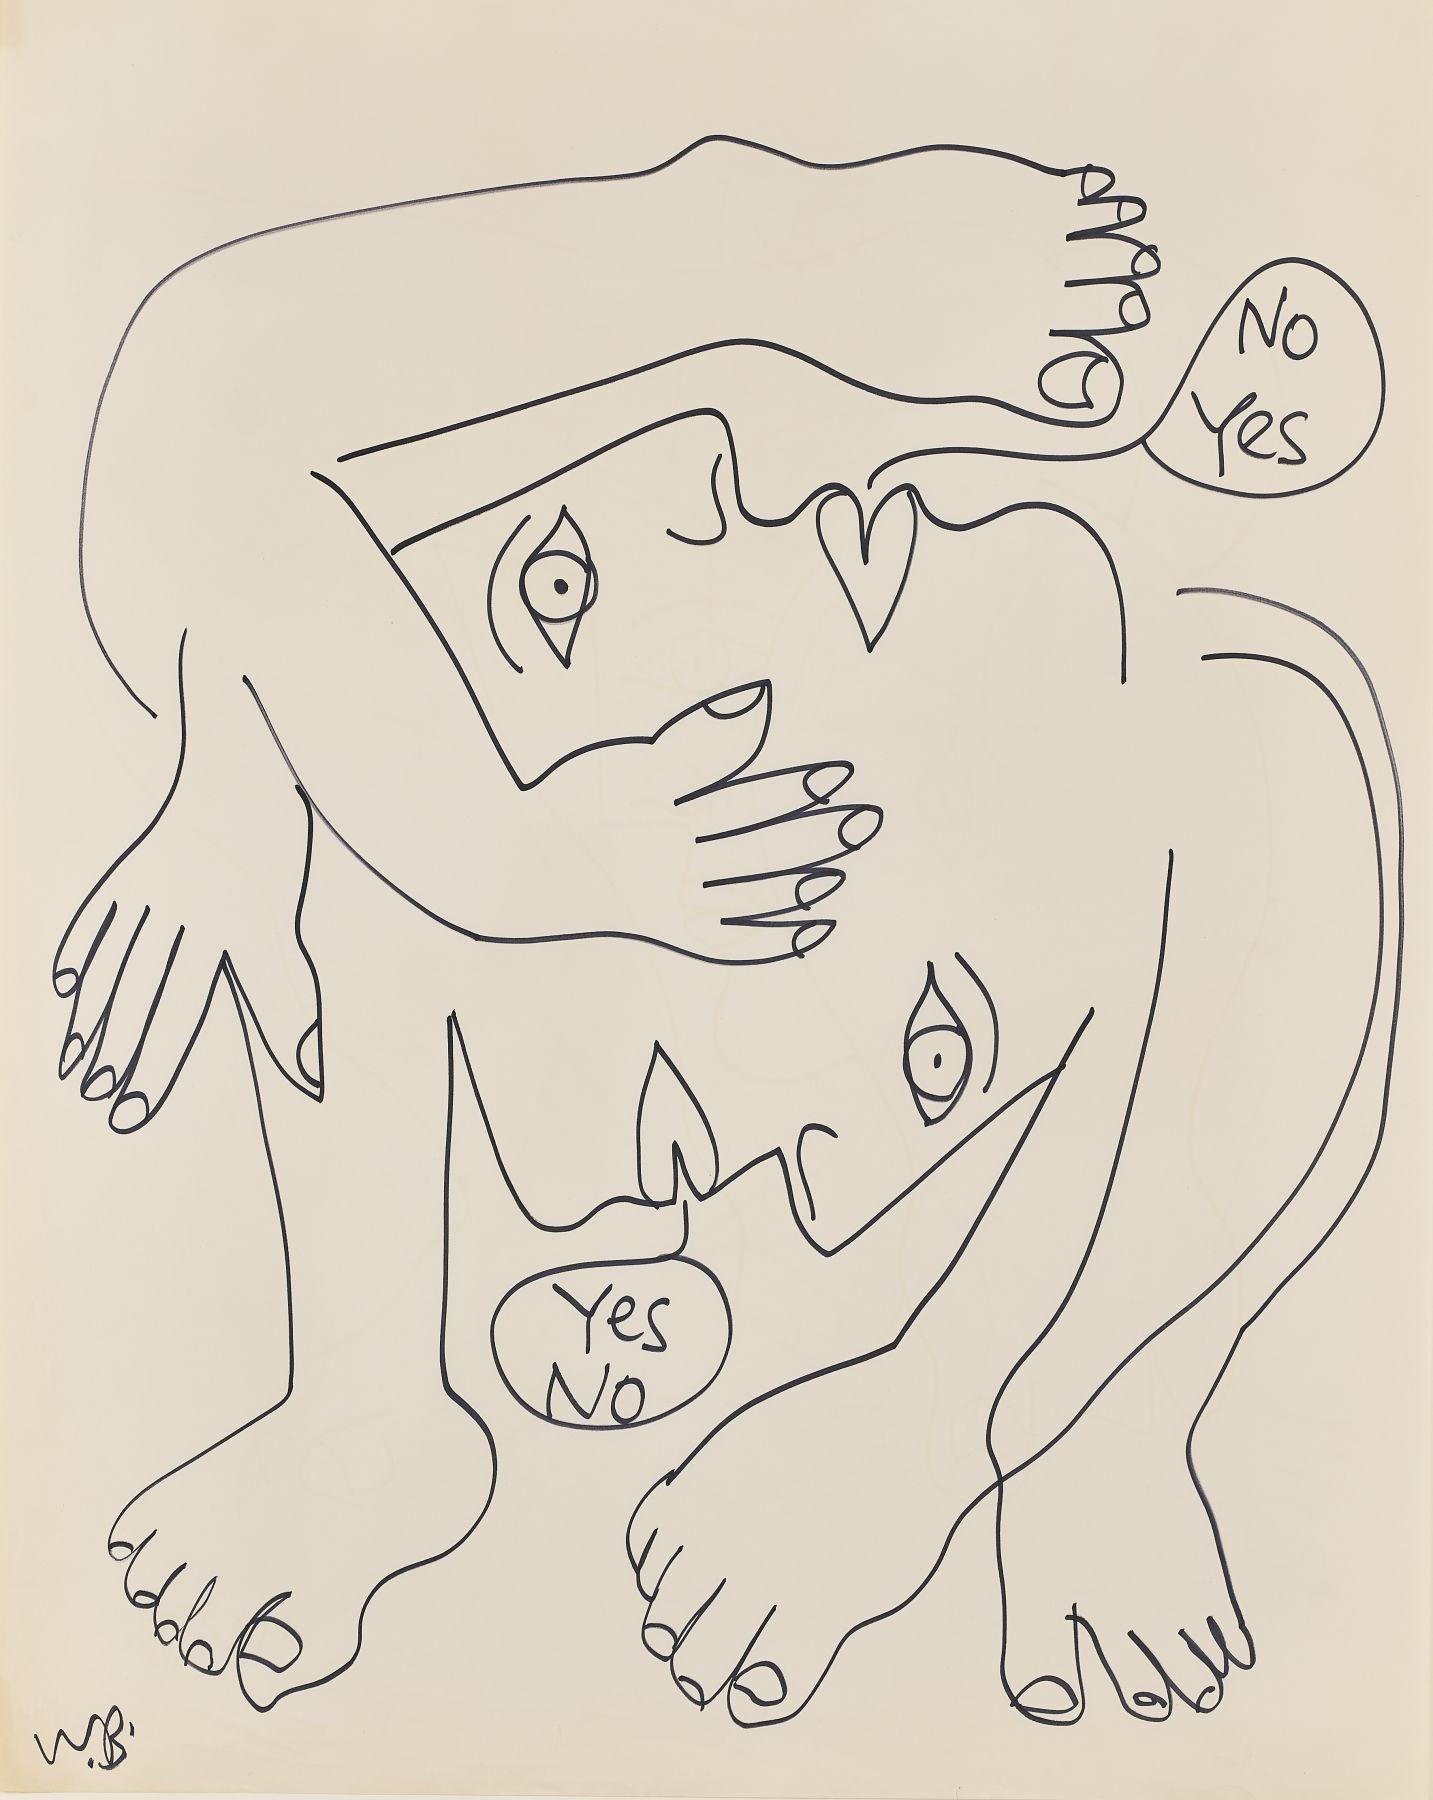 Walter Battiss - Untitled (No Yes, Yes No), 1970